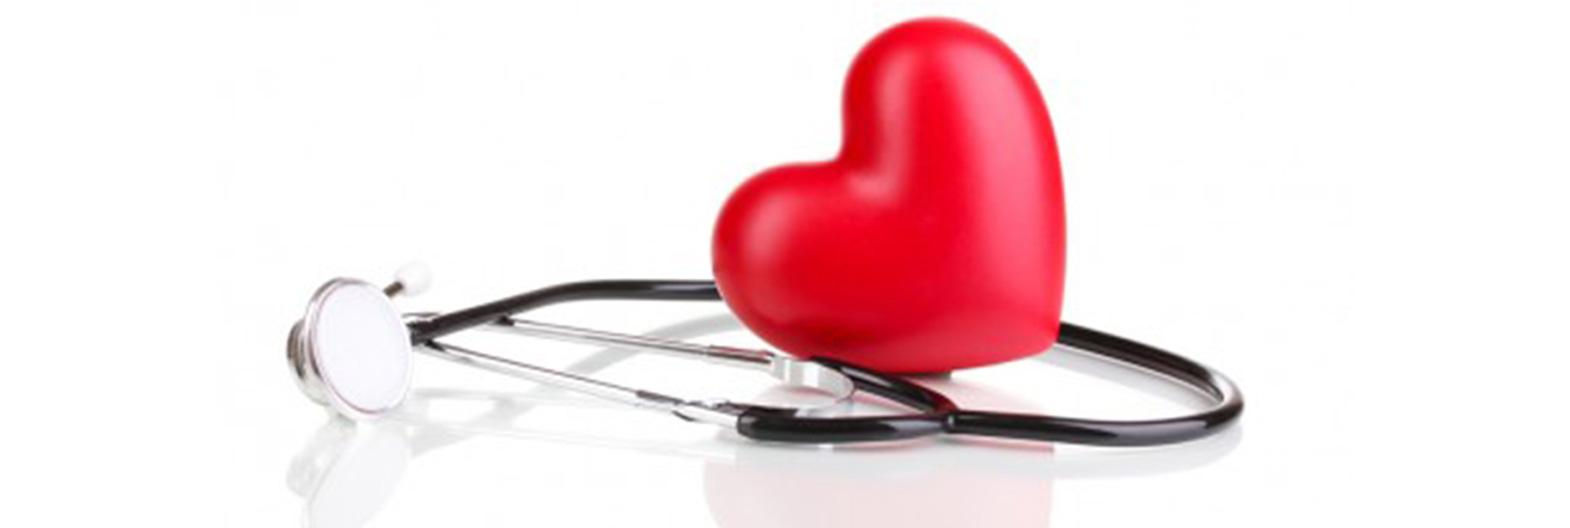 hipertenzija yra hipertenzija